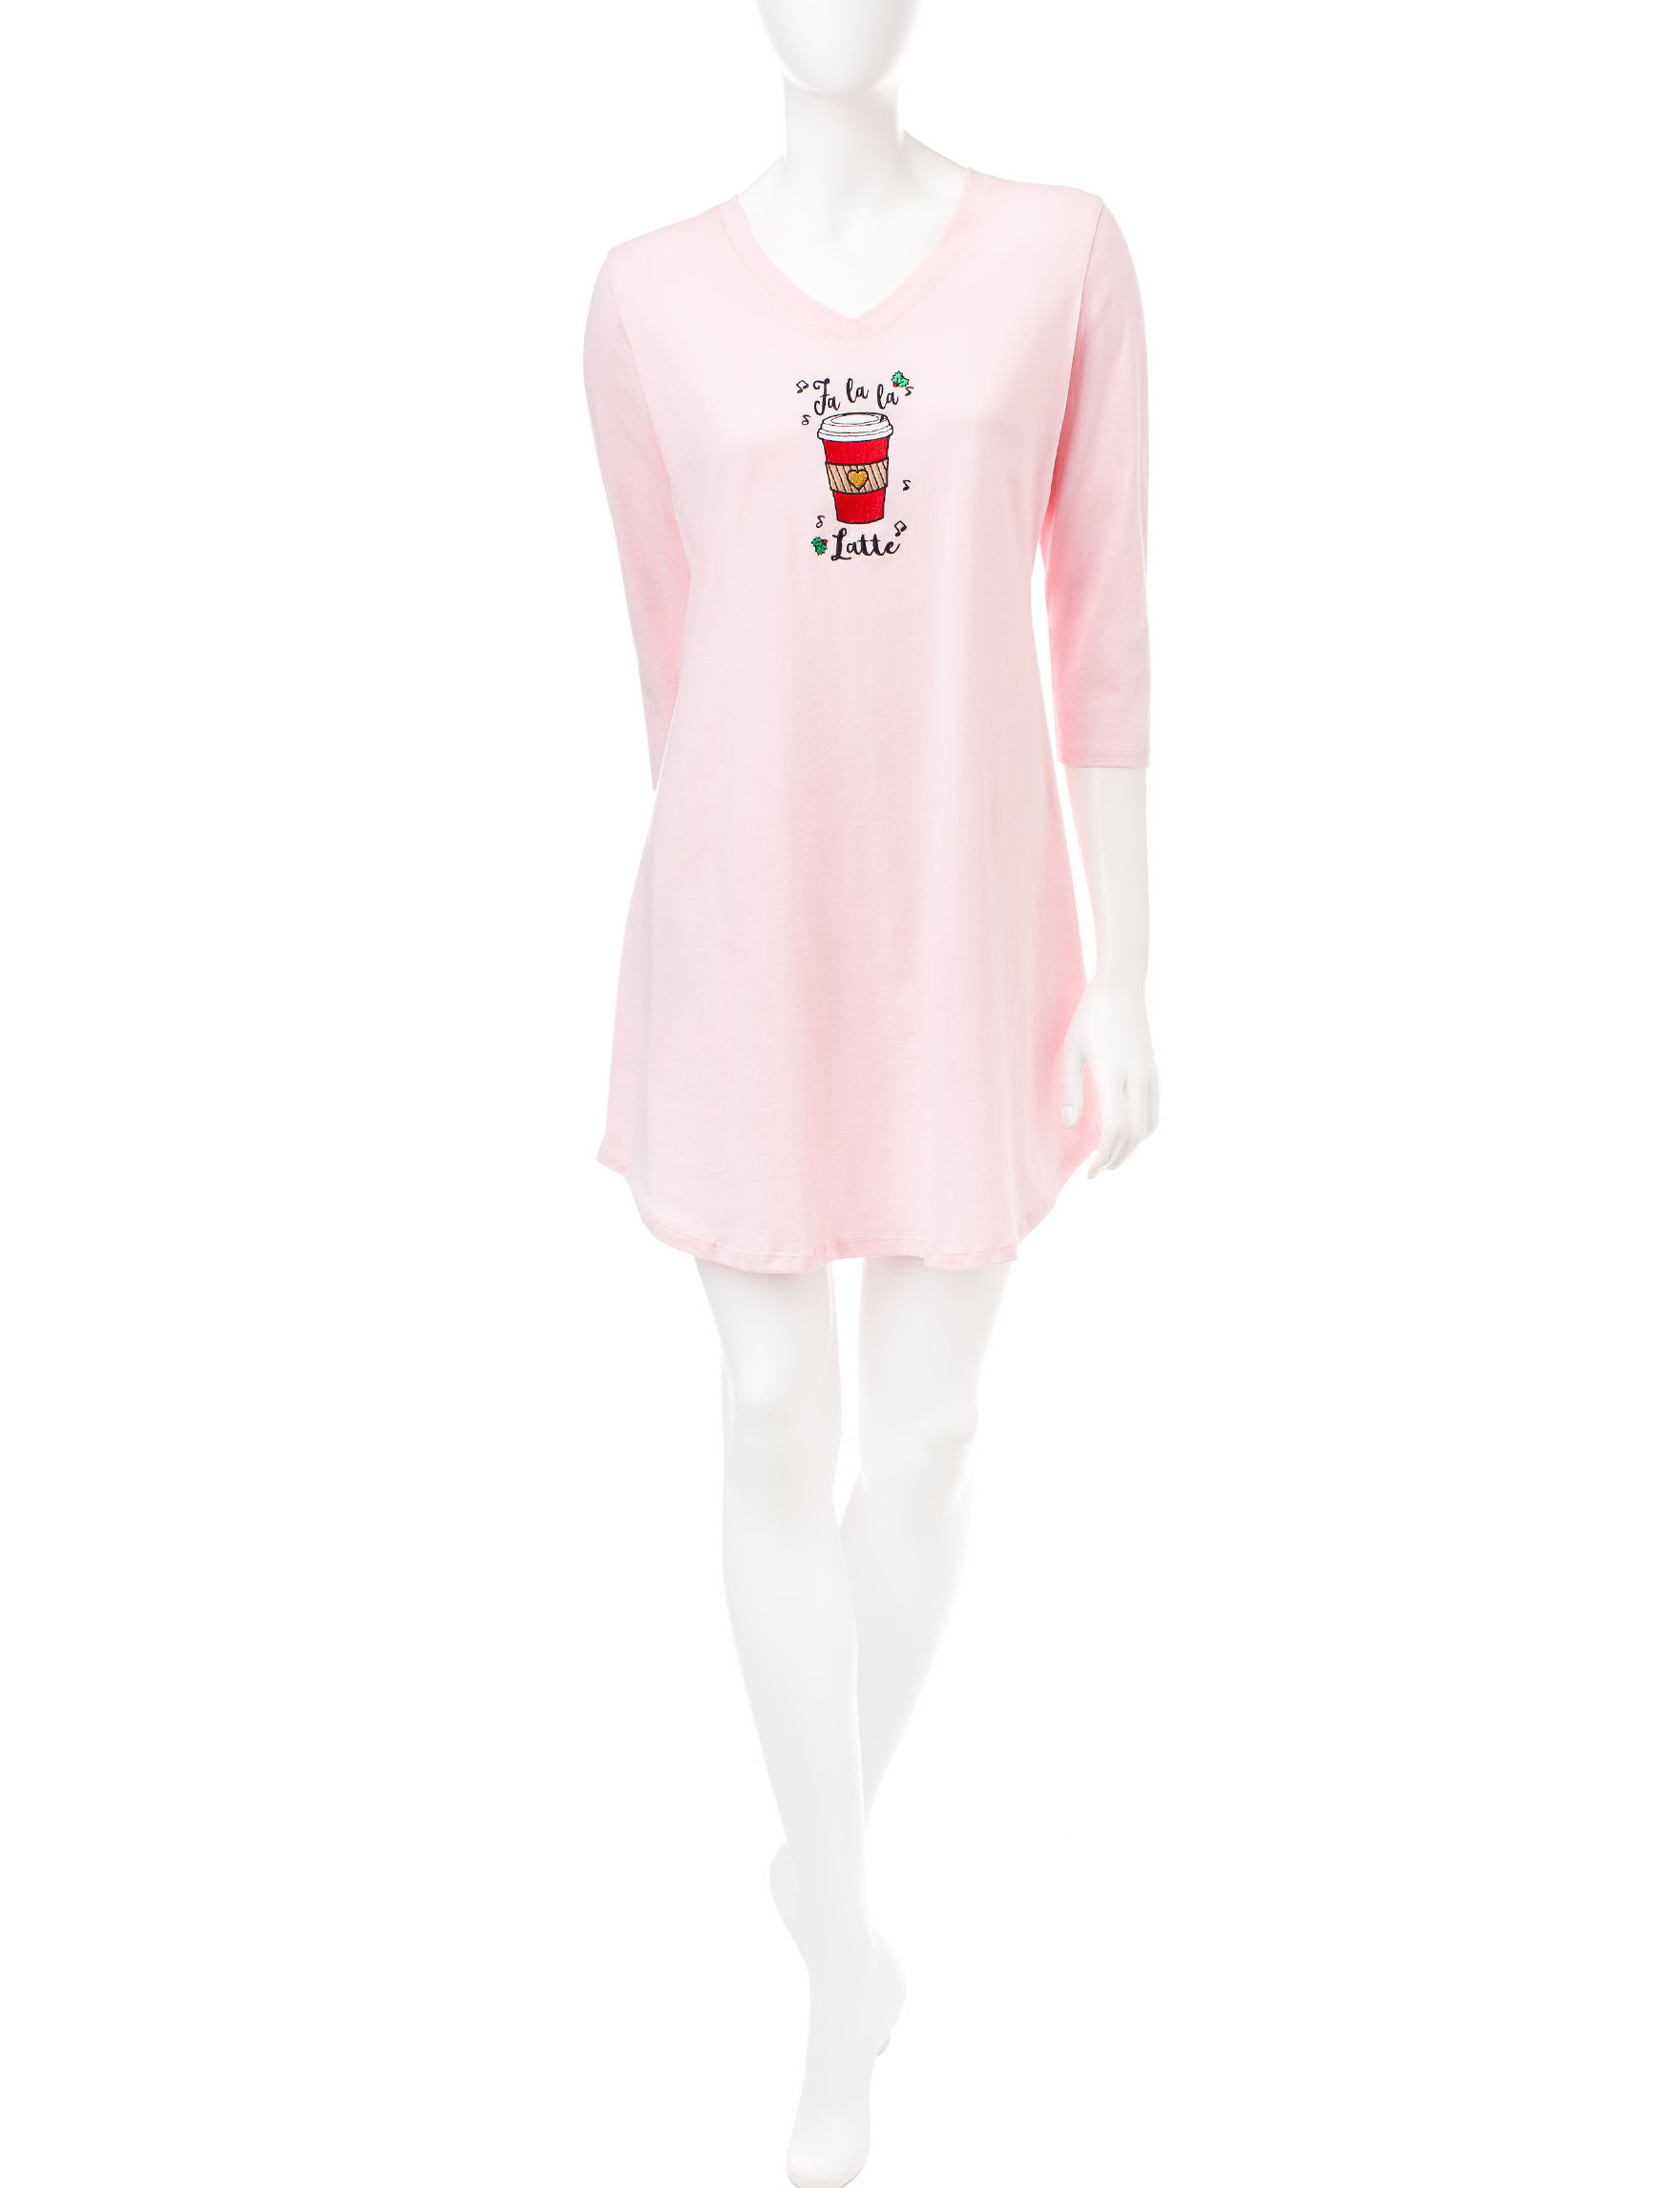 Pillow Talk Pink Nightgowns & Sleep Shirts